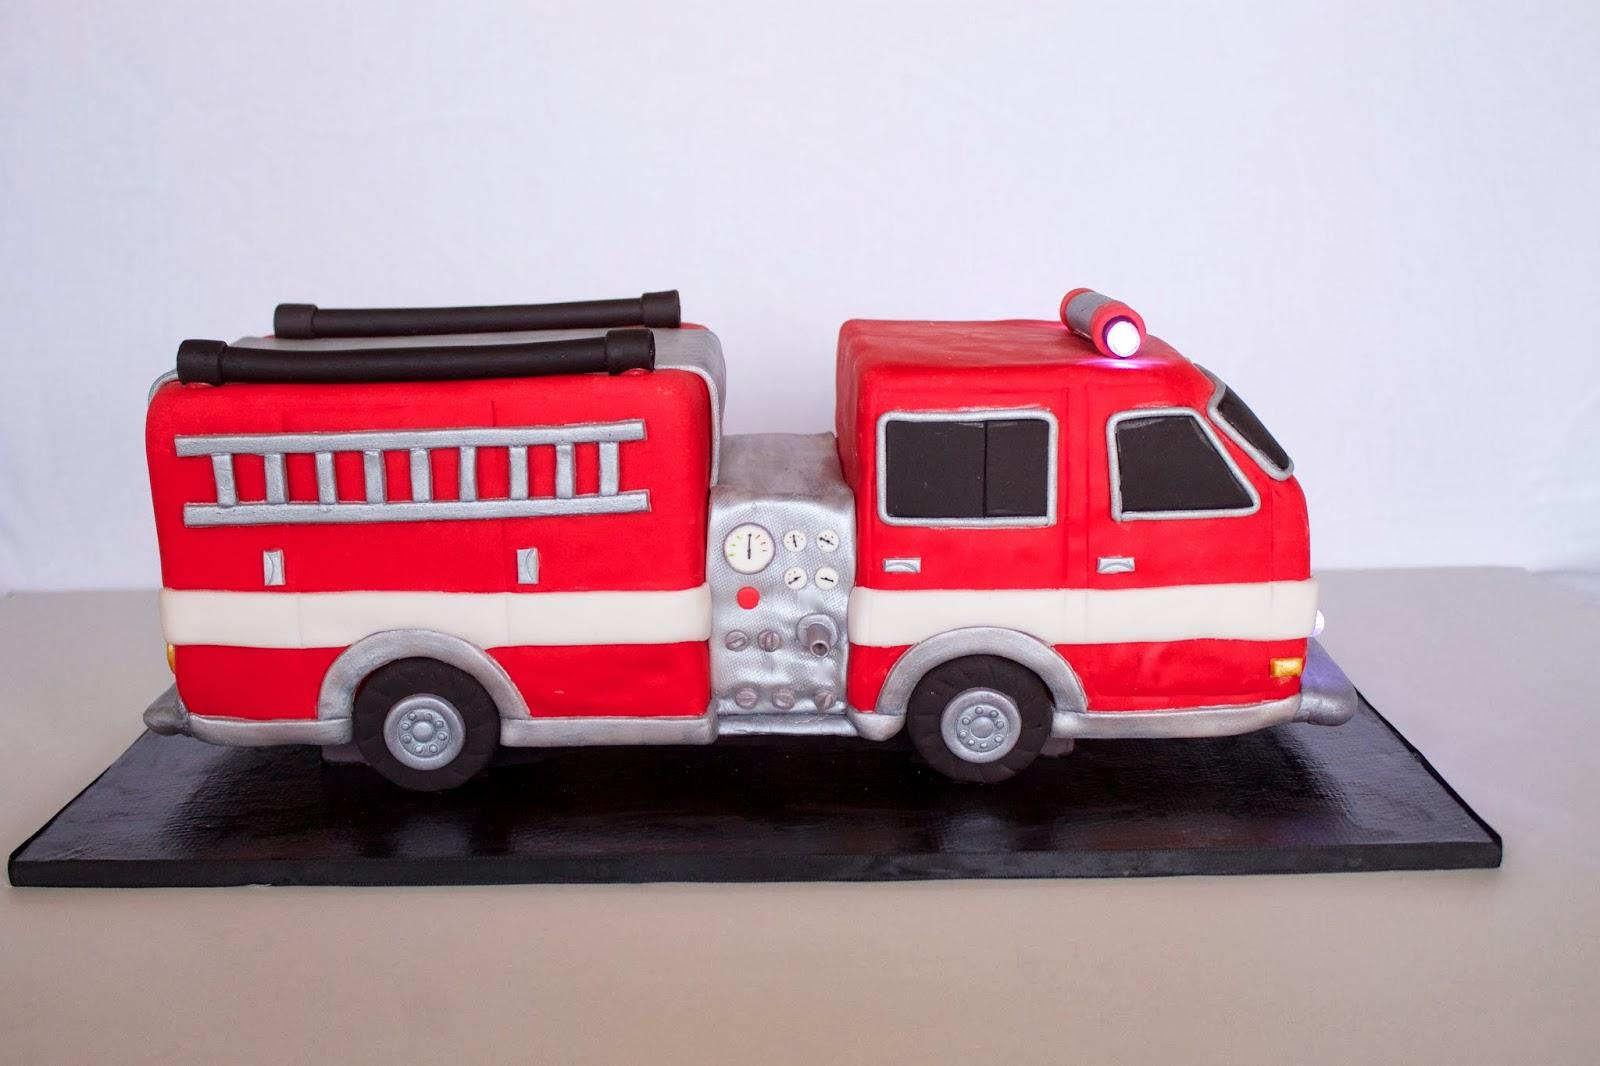 Sara Elizabeth - Custom Cakes & Gourmet Sweets: 3D Fire Truck Cake Tutorial